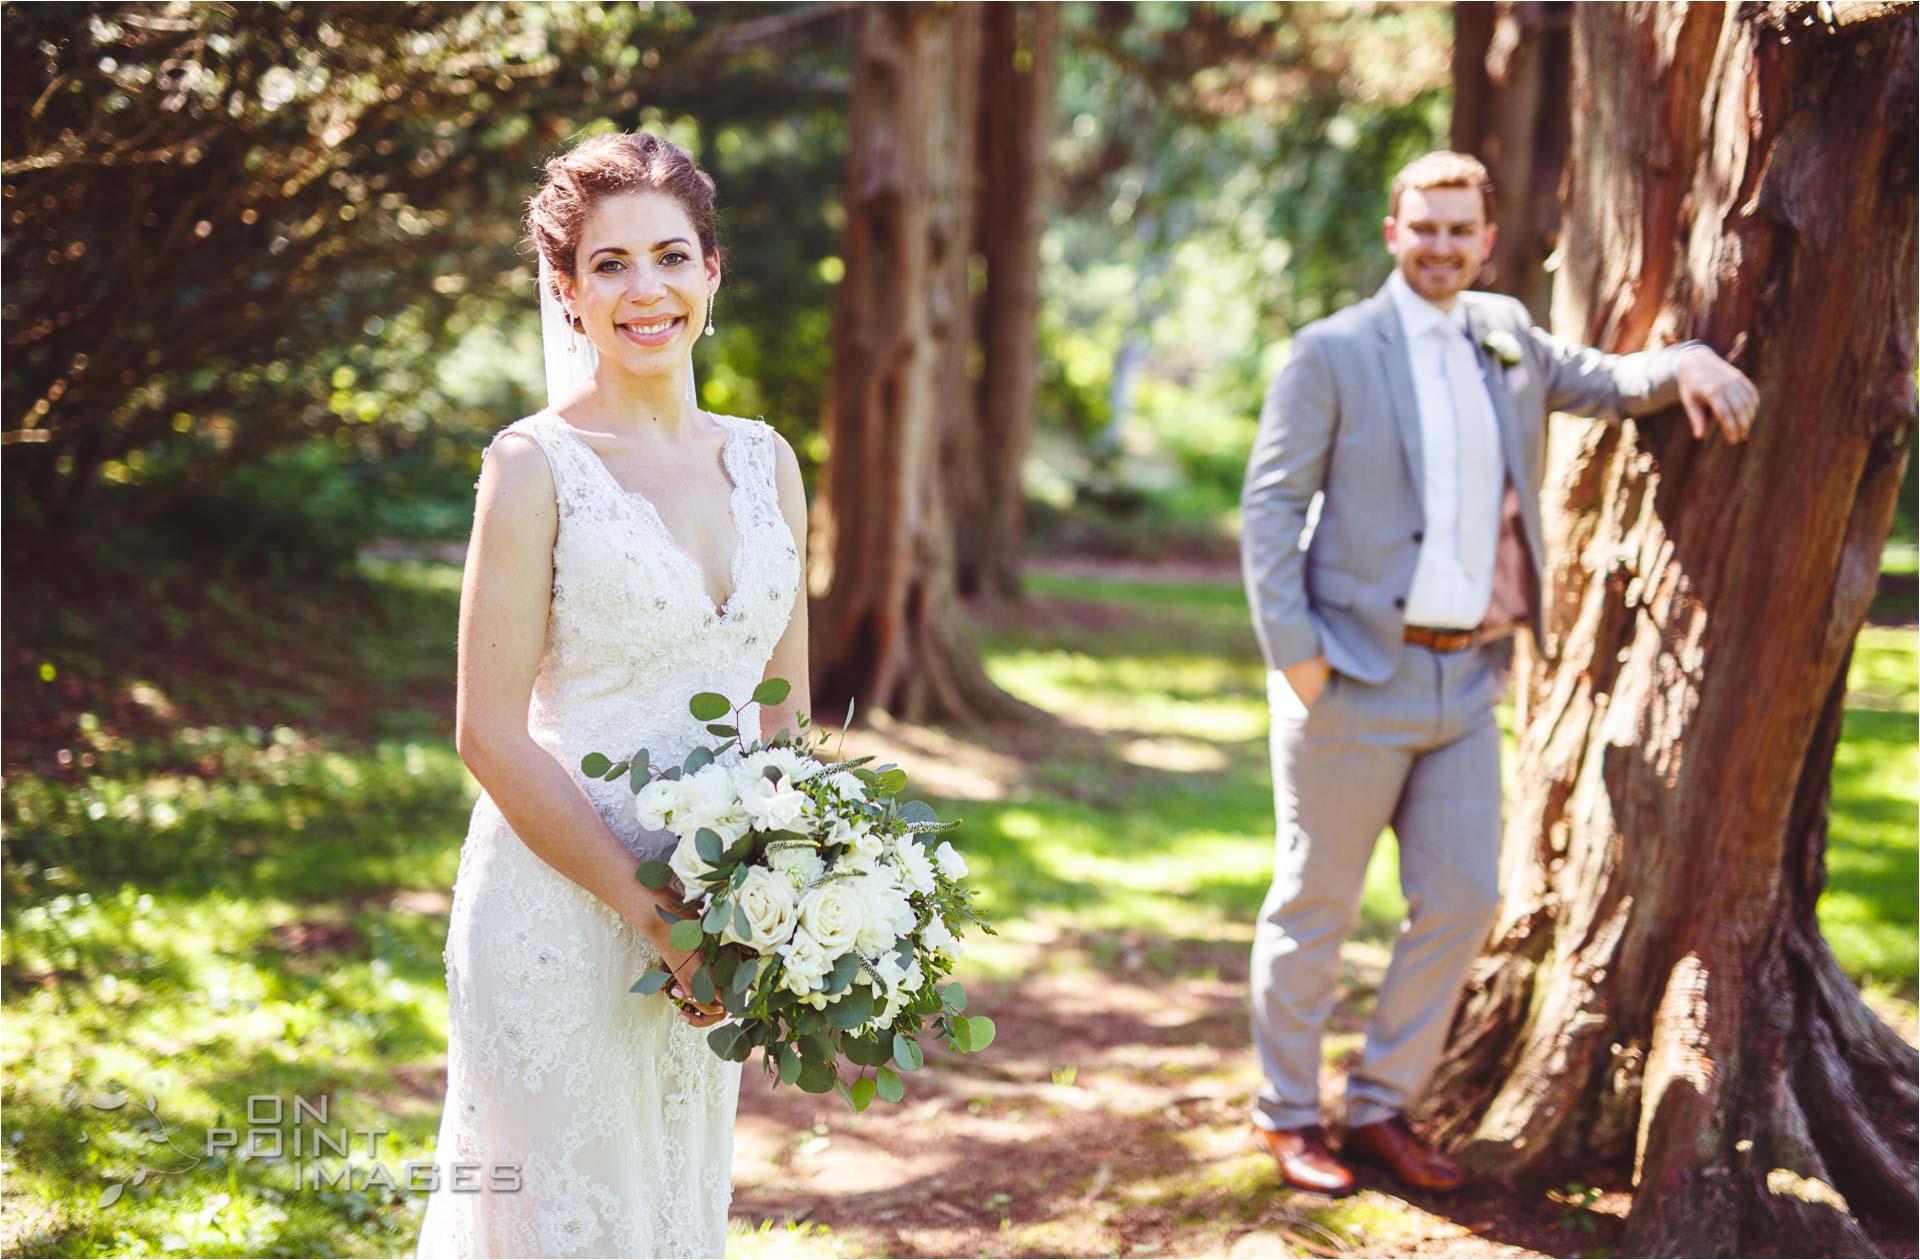 wickham-park-wedding-photographer-ct-13.jpg